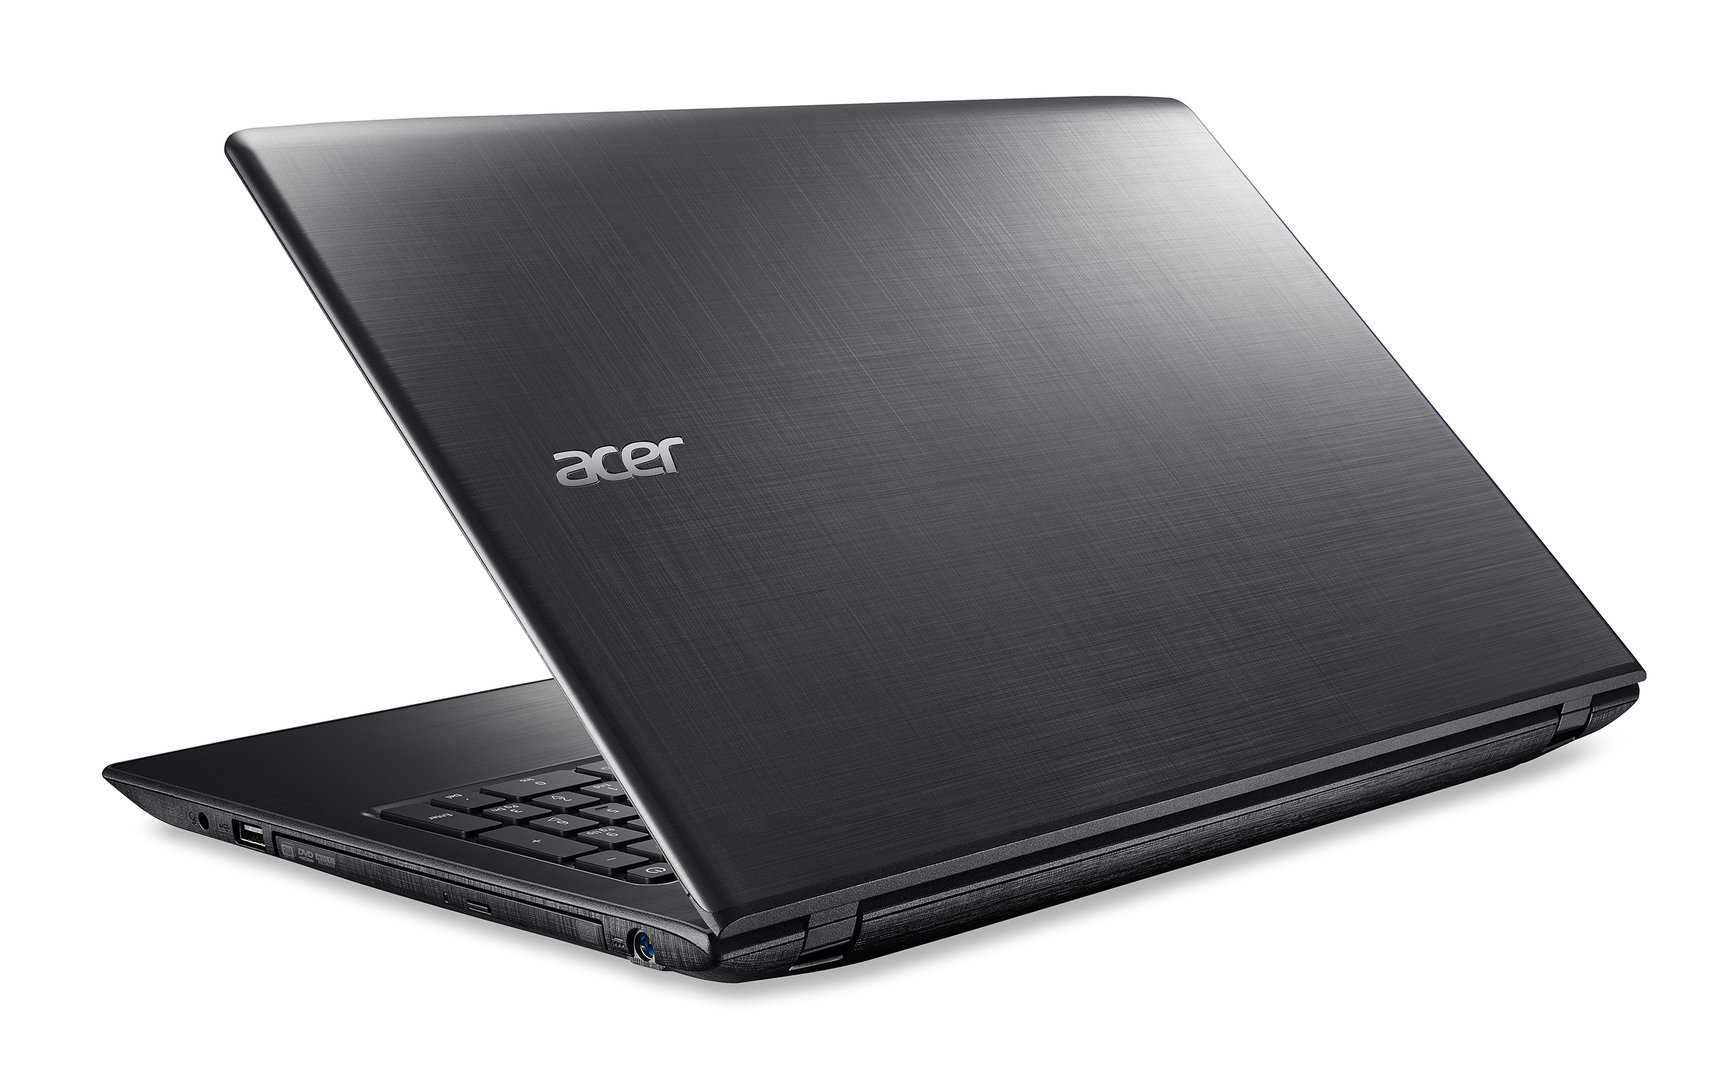 Acer Aspire E 15 Obsidian Black